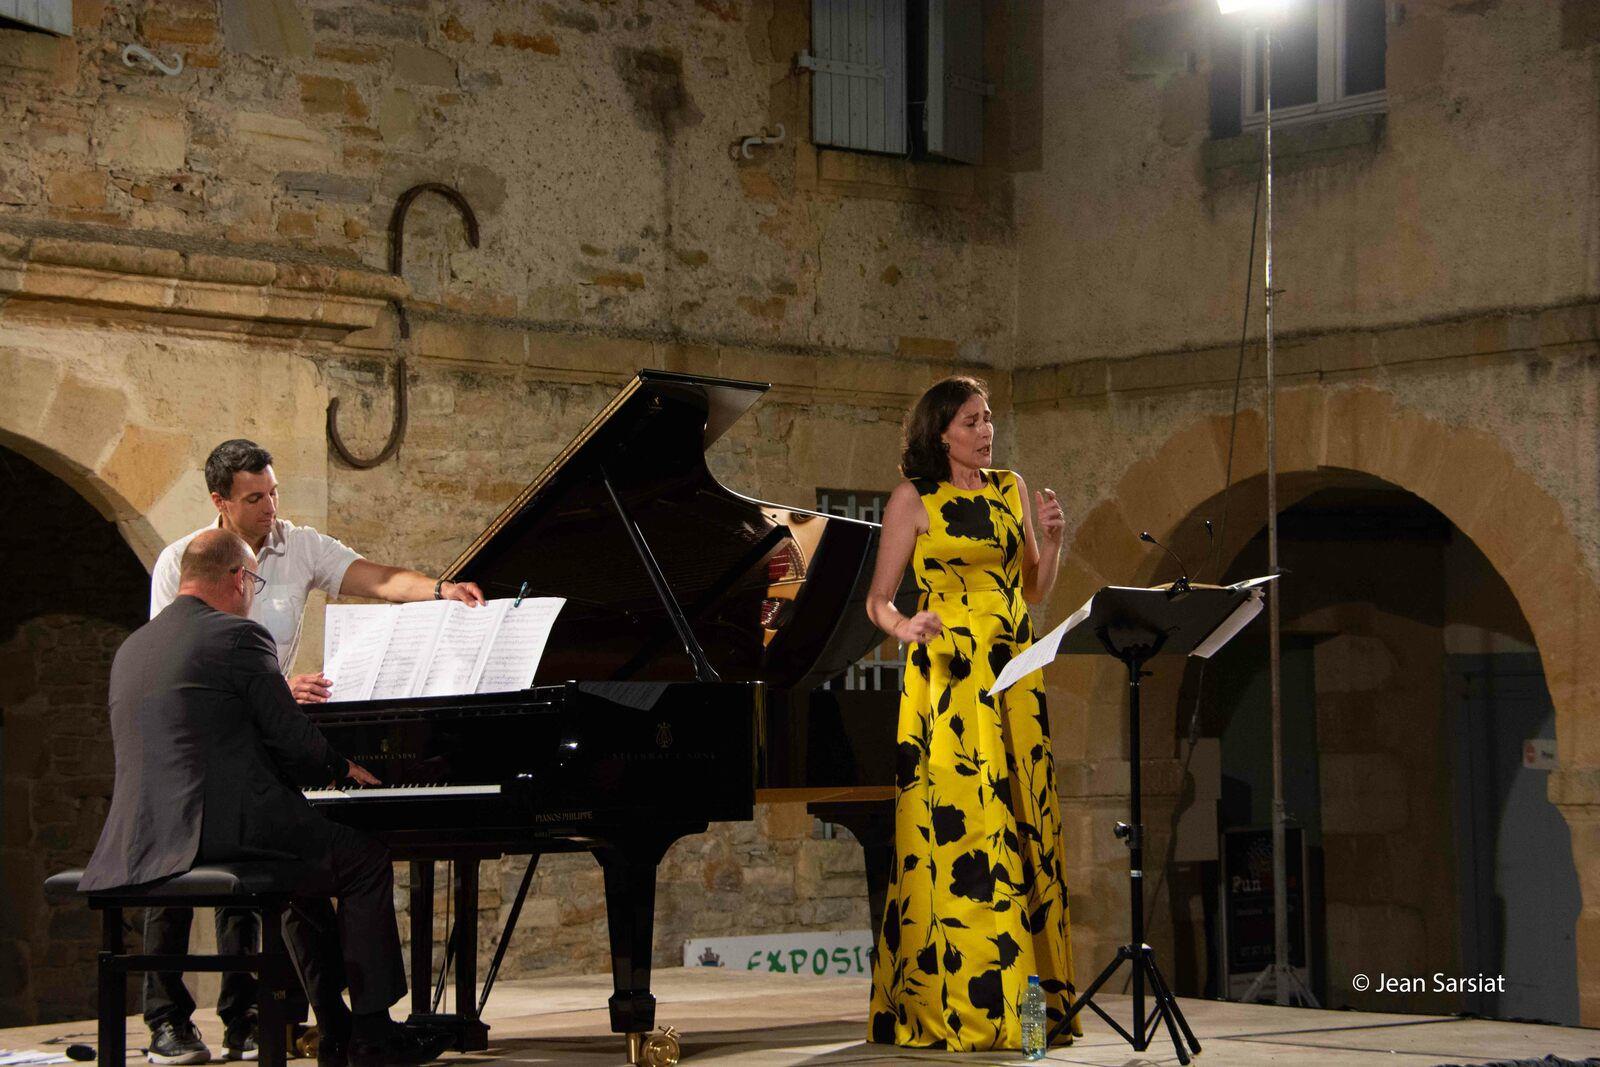 FESTIVAL PIERRES LYRIQUES : VERONIQUE GENS ILLUMINE L'ARSENAL